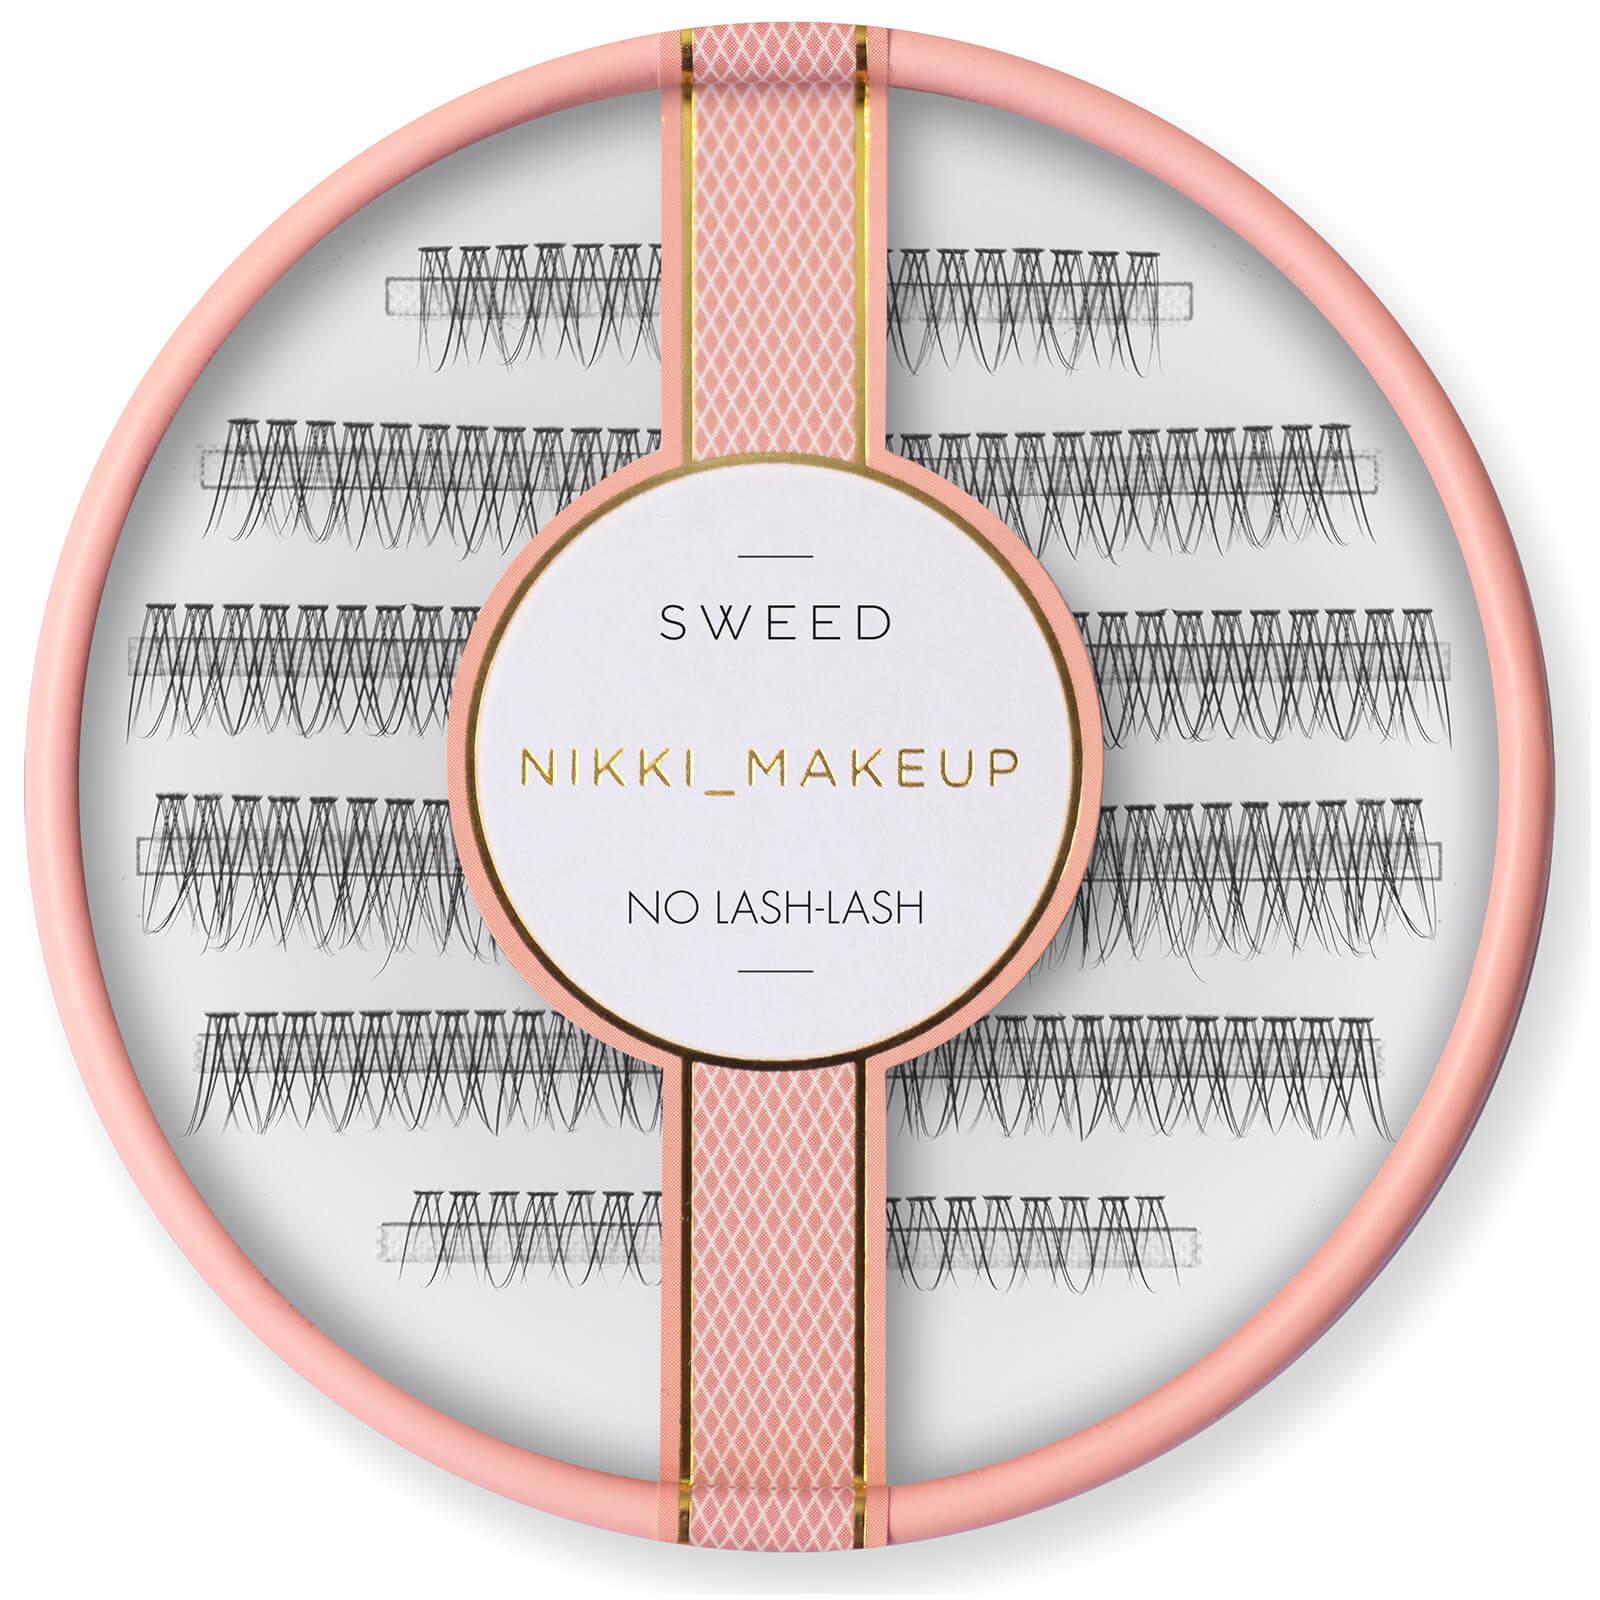 Купить Sweed Lashes Nikki No Lash-Lash - Black